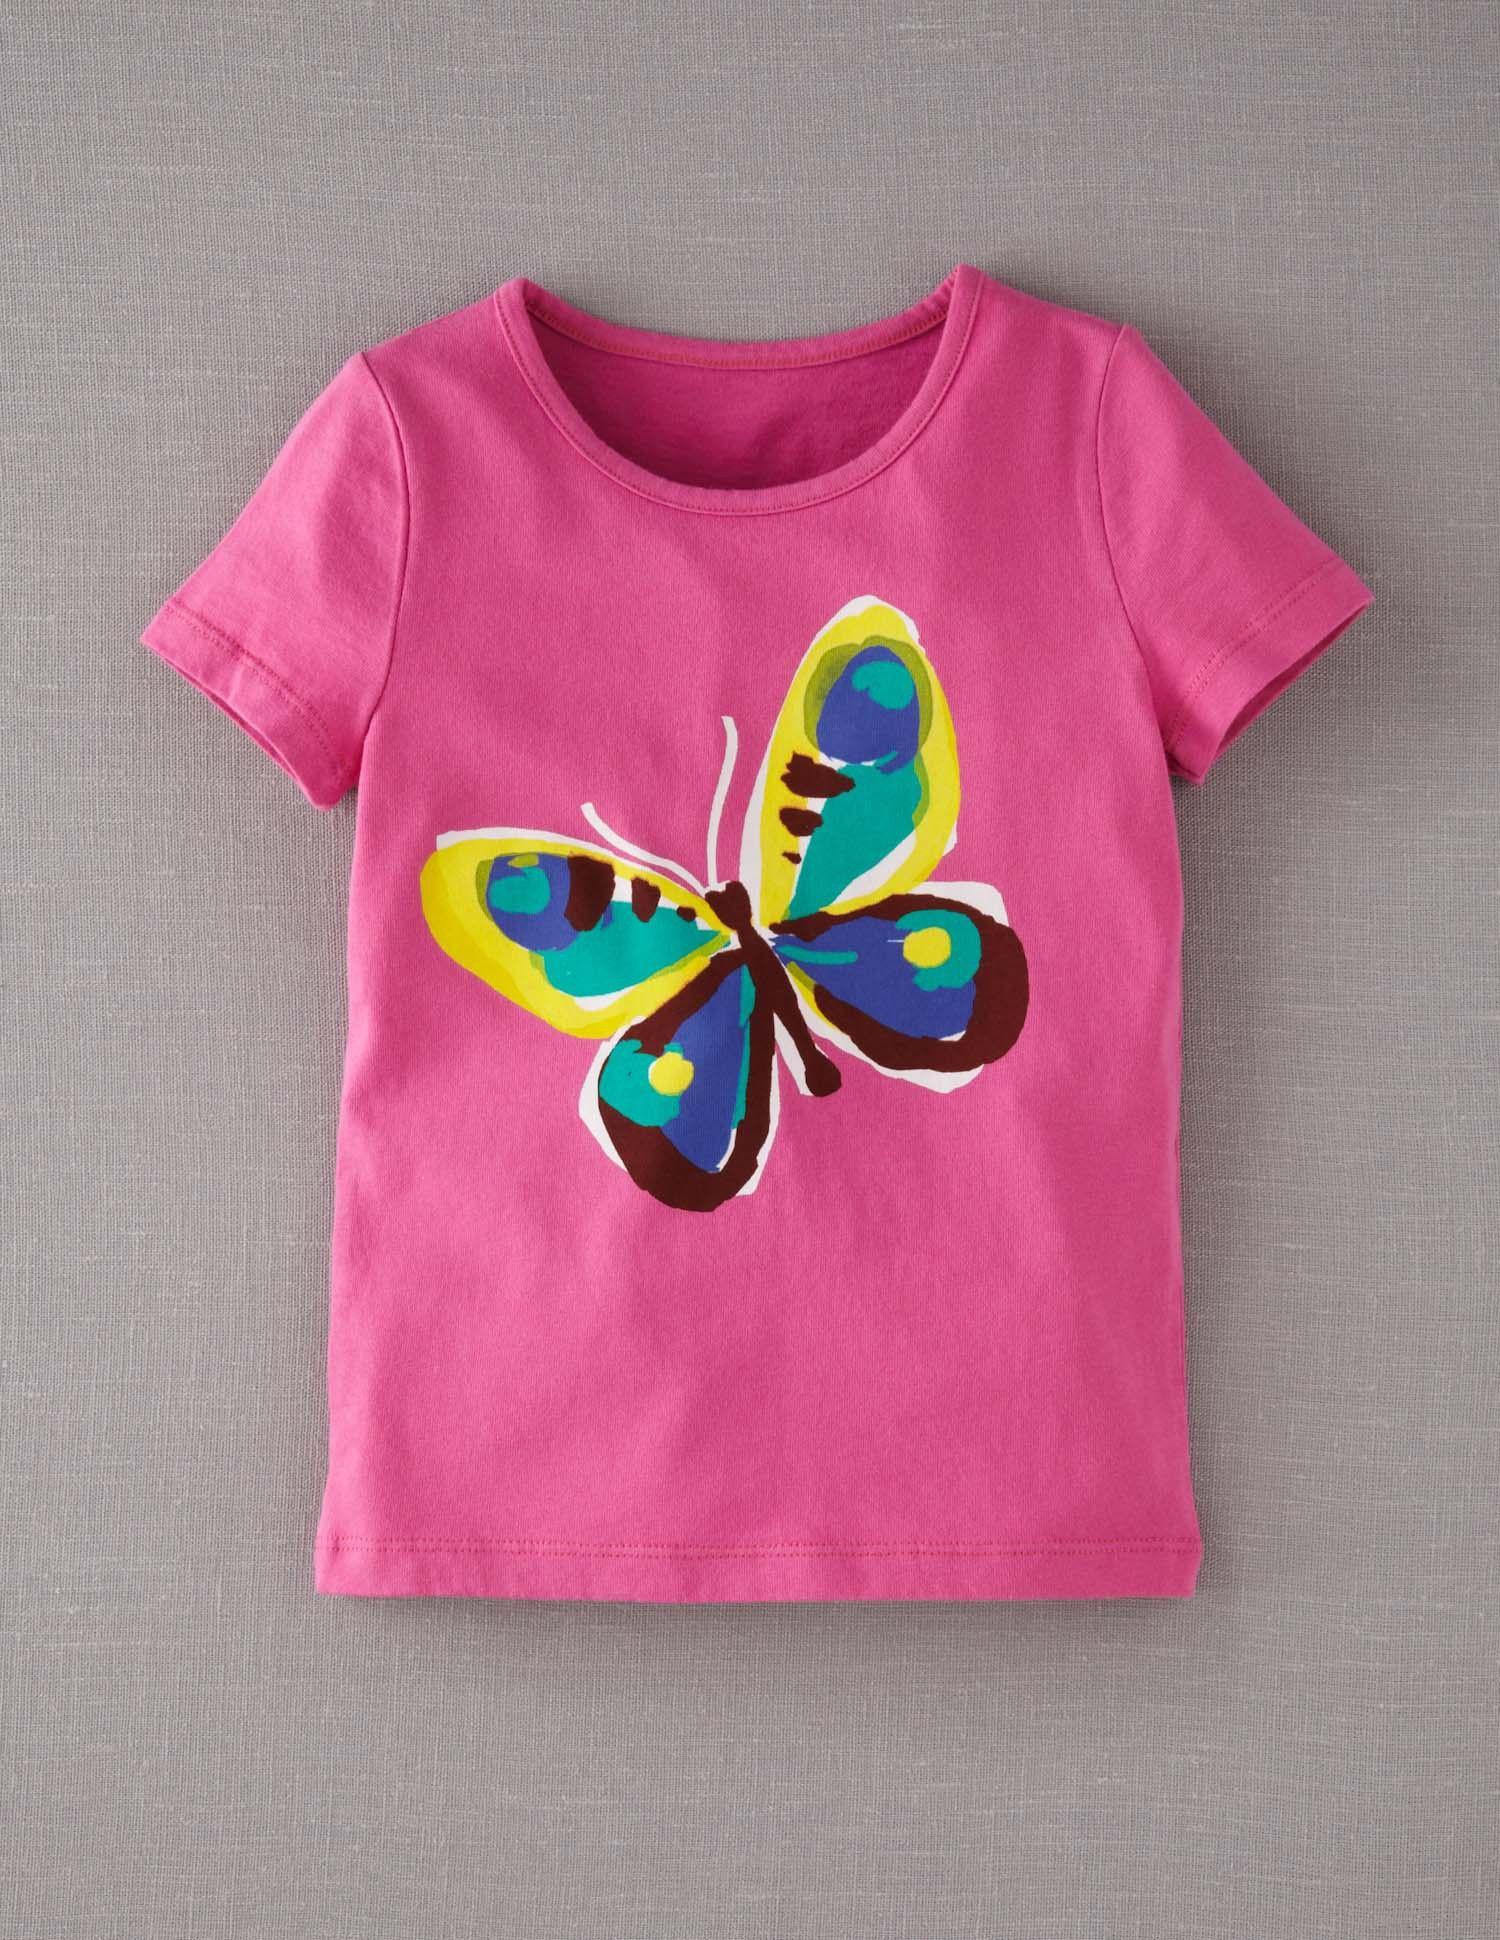 9c32d1fc5 Mini Boden ss13 Colourful Carnival T-shirt